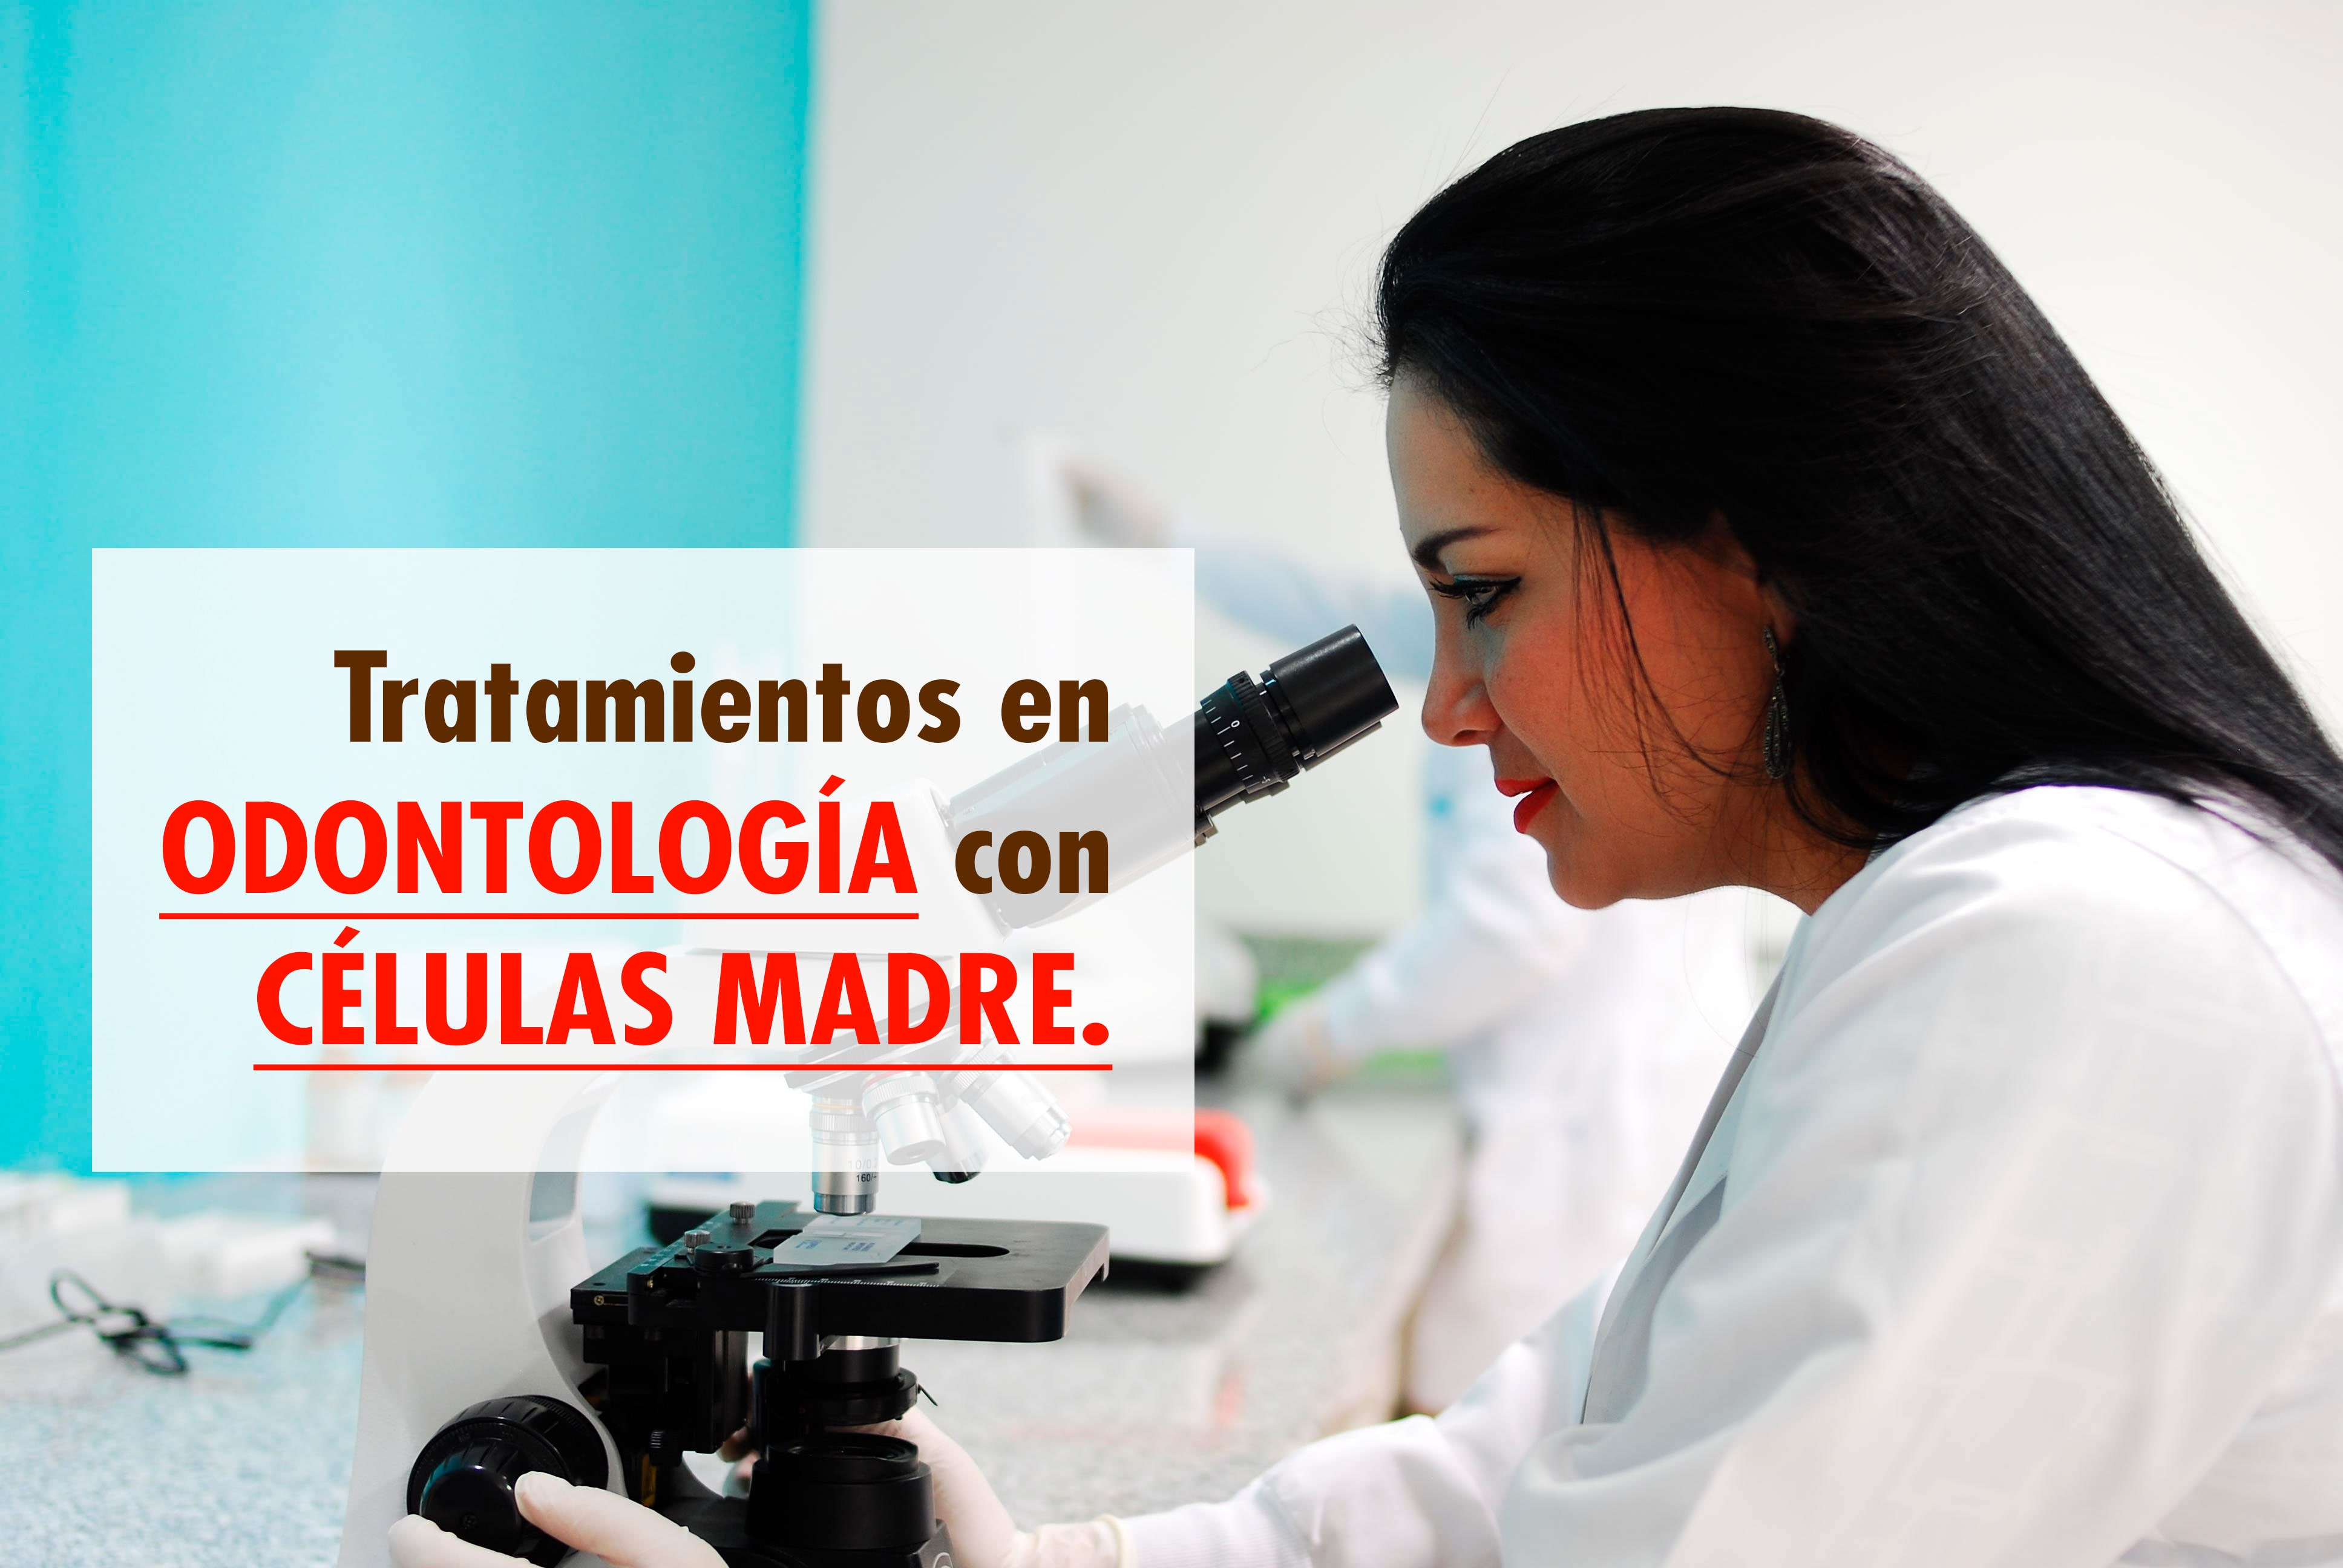 celulas-madre-en-odontologia